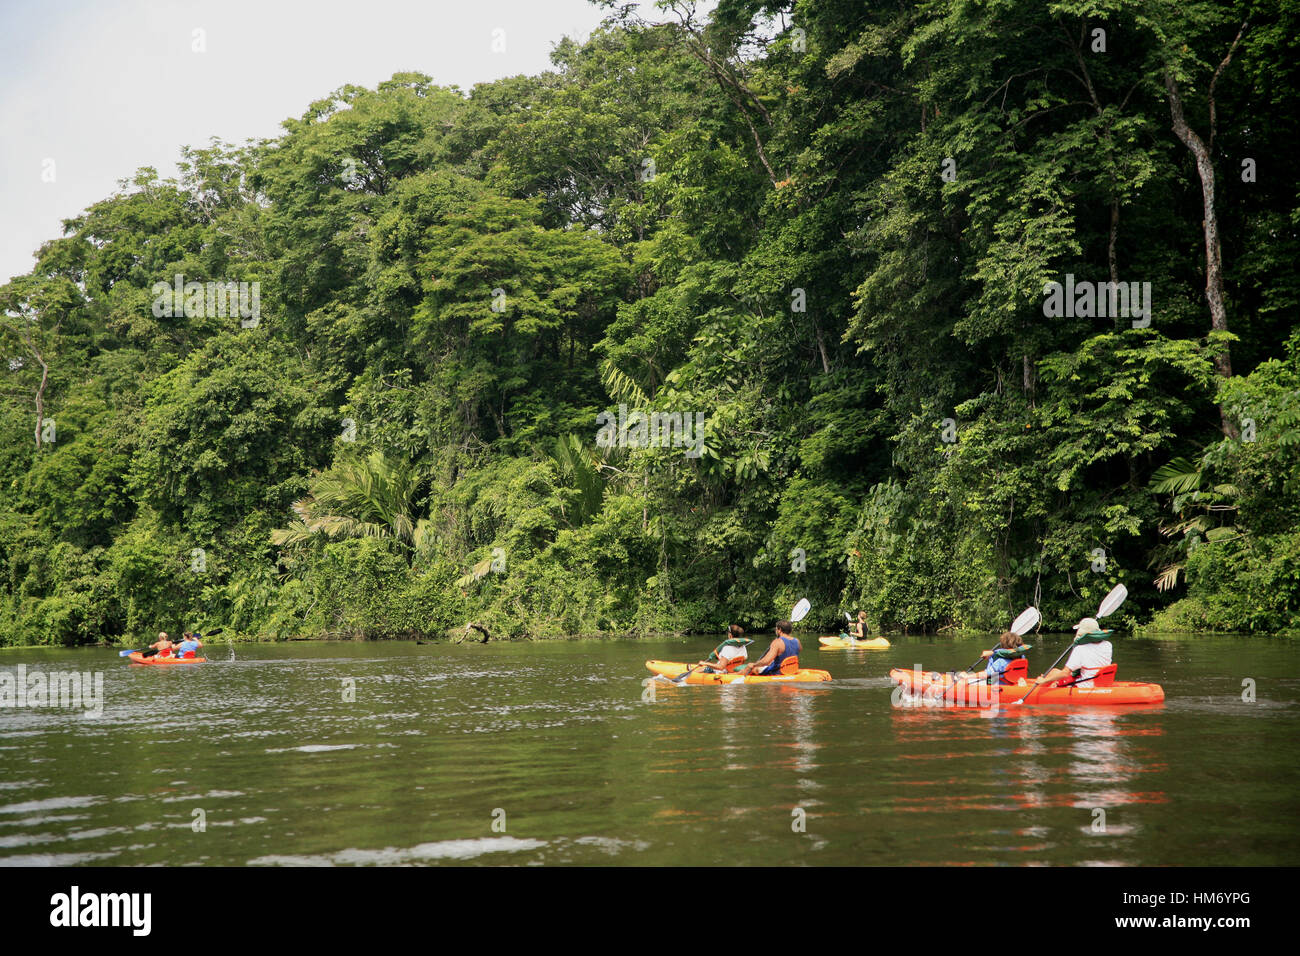 Tourists in Kayaks / Turistas en Kayak Rainforest / Bosque Lluvioso Tortuguero, Costa Rica. Code/Código #T0120 - Stock Image